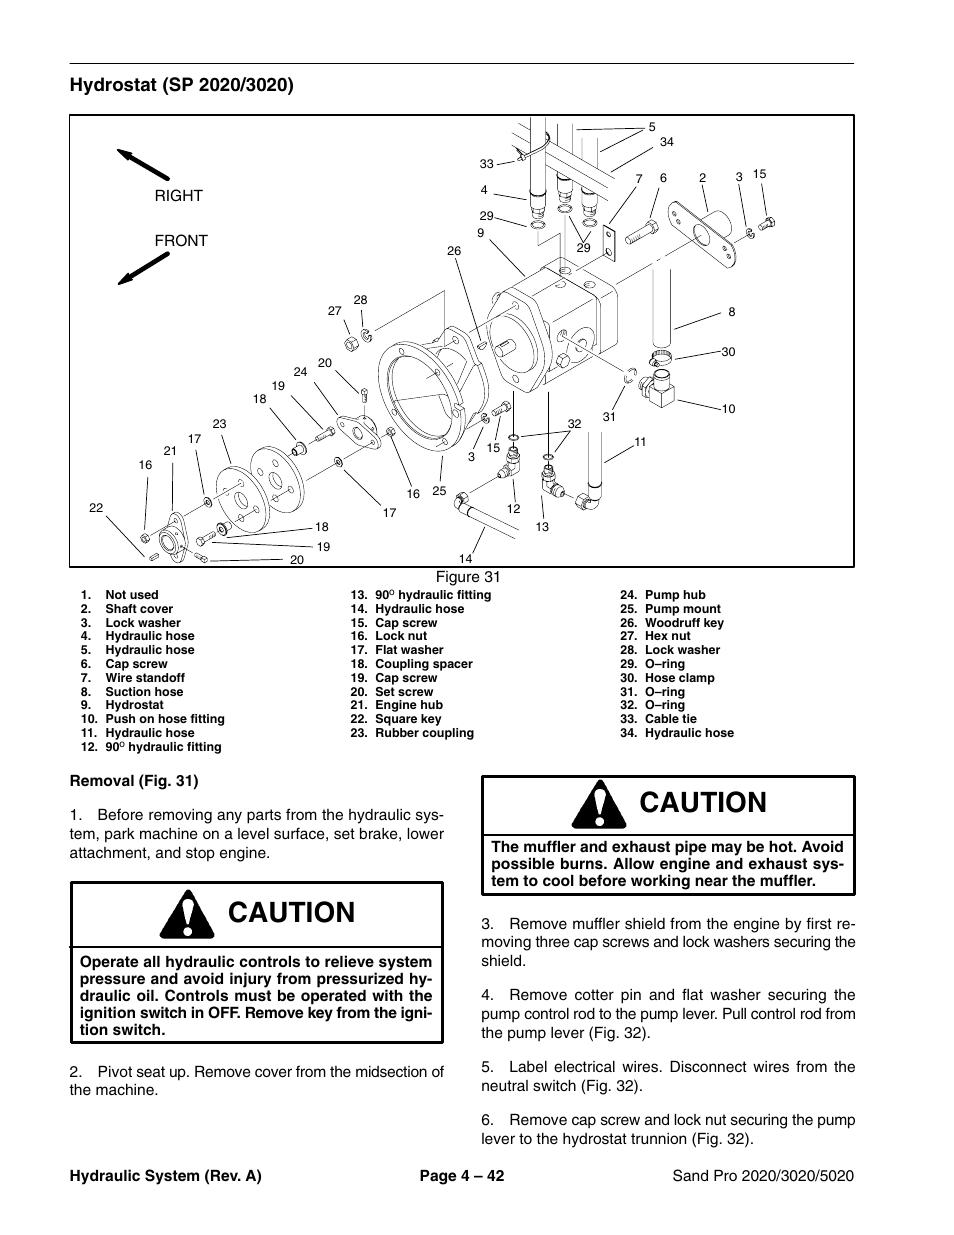 hydrostat sp 2020 3020 caution toro sand pro 5020 user manual rh manualsdir com Toro Wheel Horse Wiring-Diagram 3 Phase Wiring Schematic